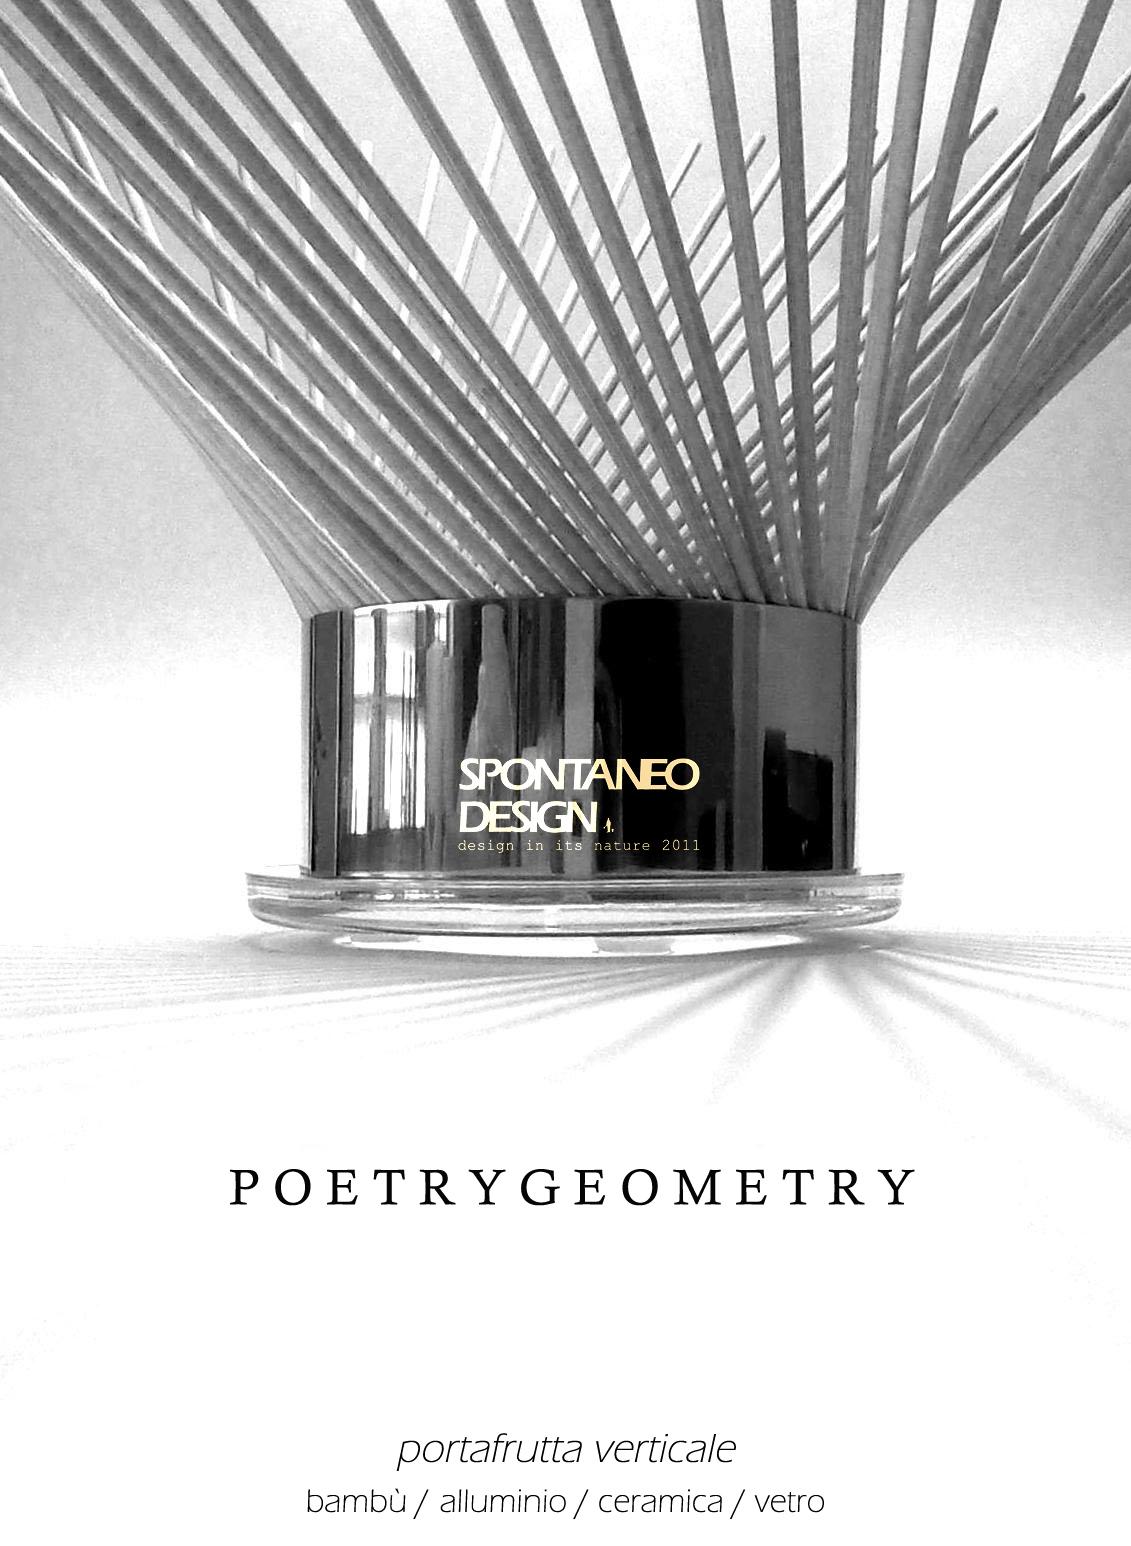 Poetry Geometry 2012 -  Portafrutta a riempimento verticale.